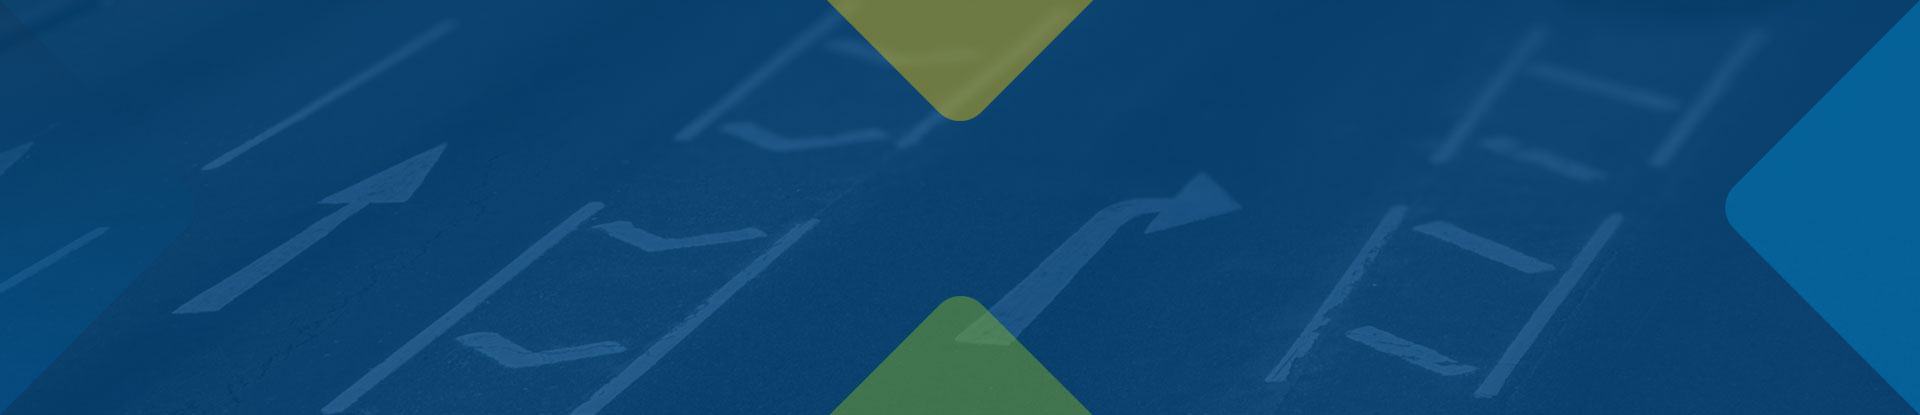 SynX Banner Drive ID